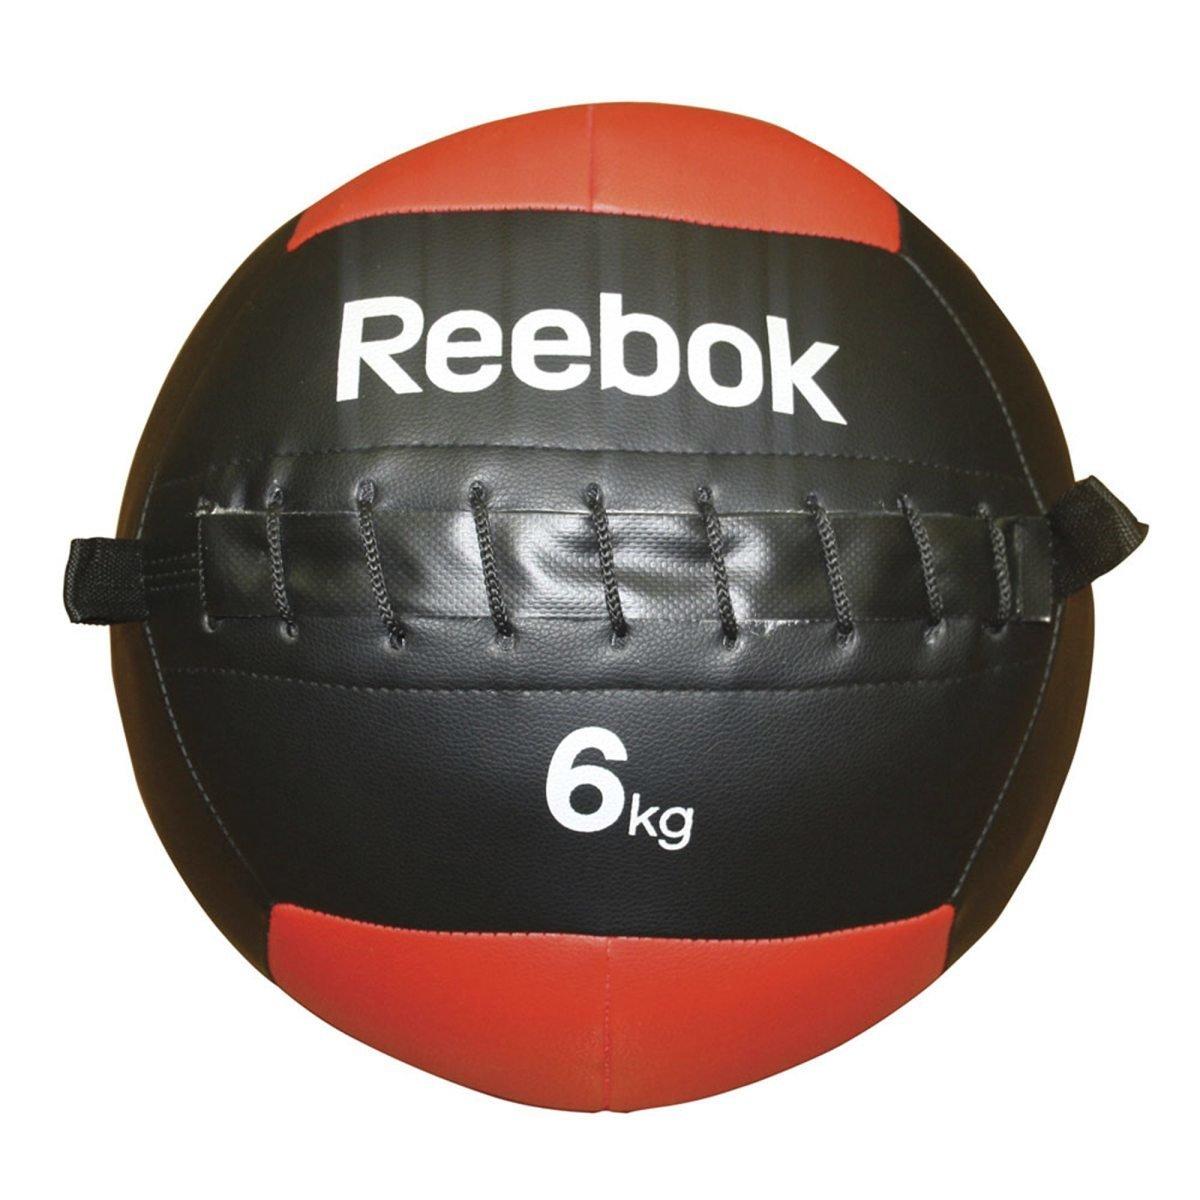 Reebok Studio Softball 10kg